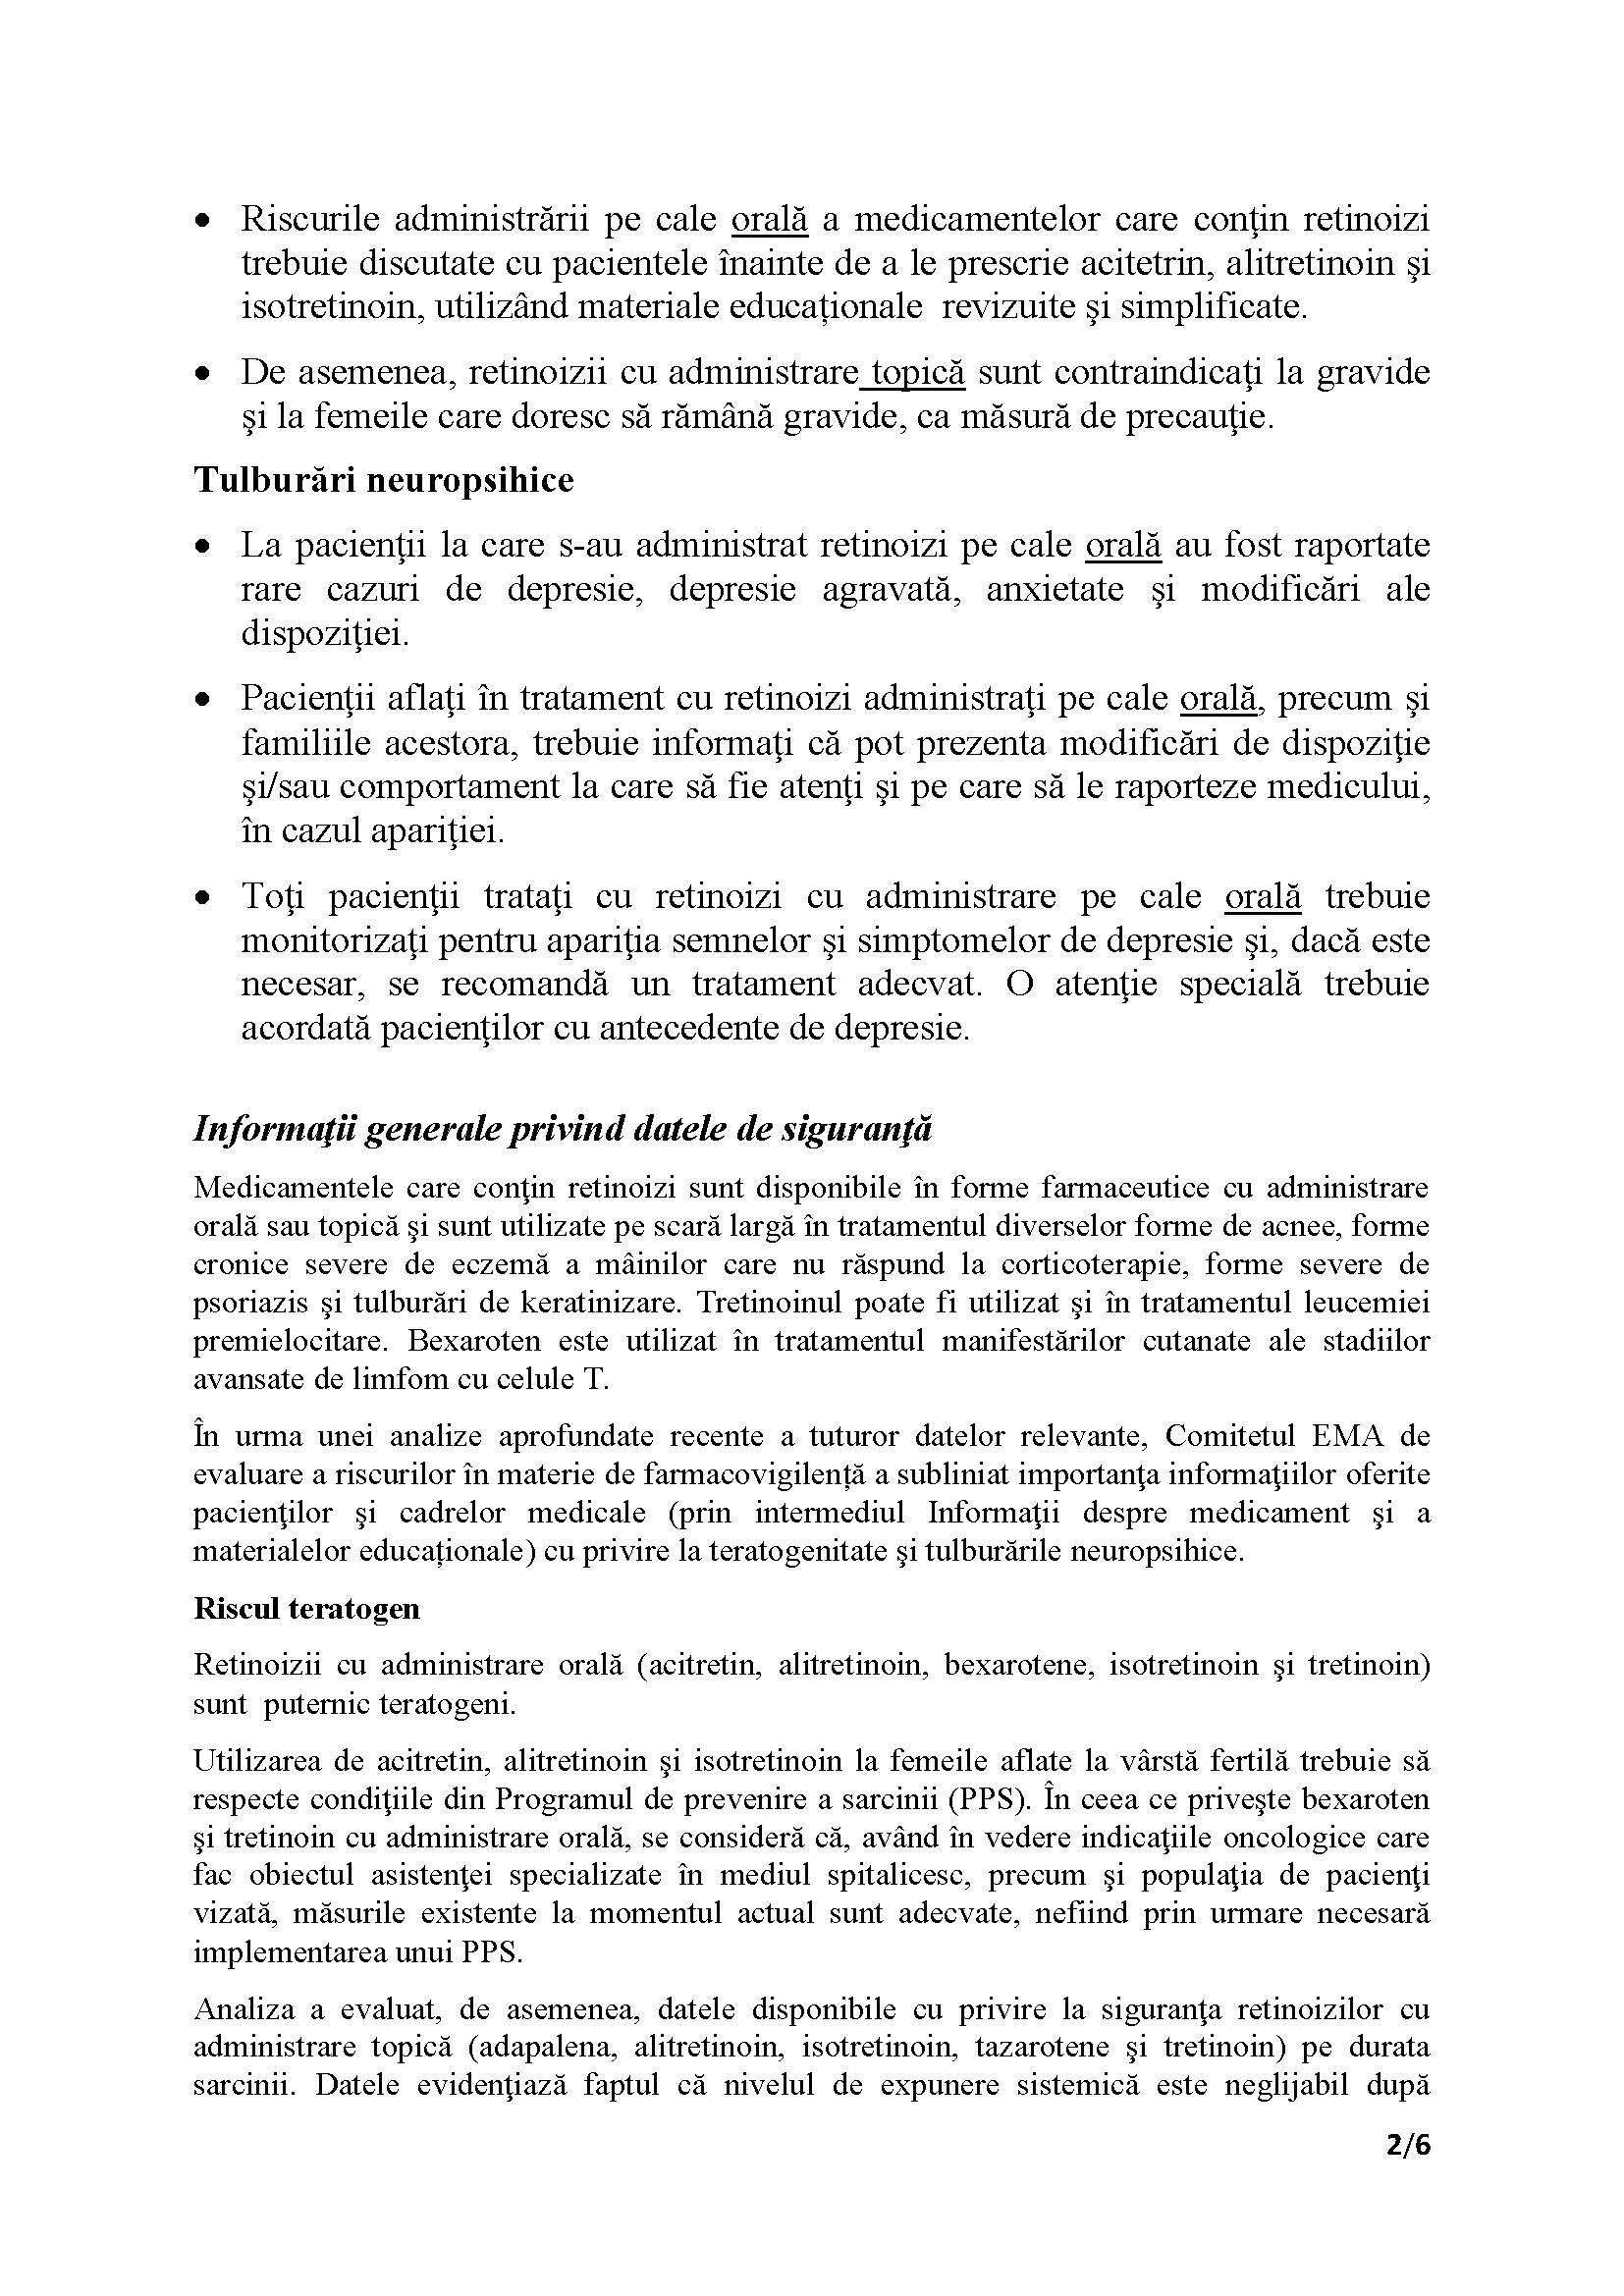 DHPC-Retinoizi_11.09.2018_Page_2